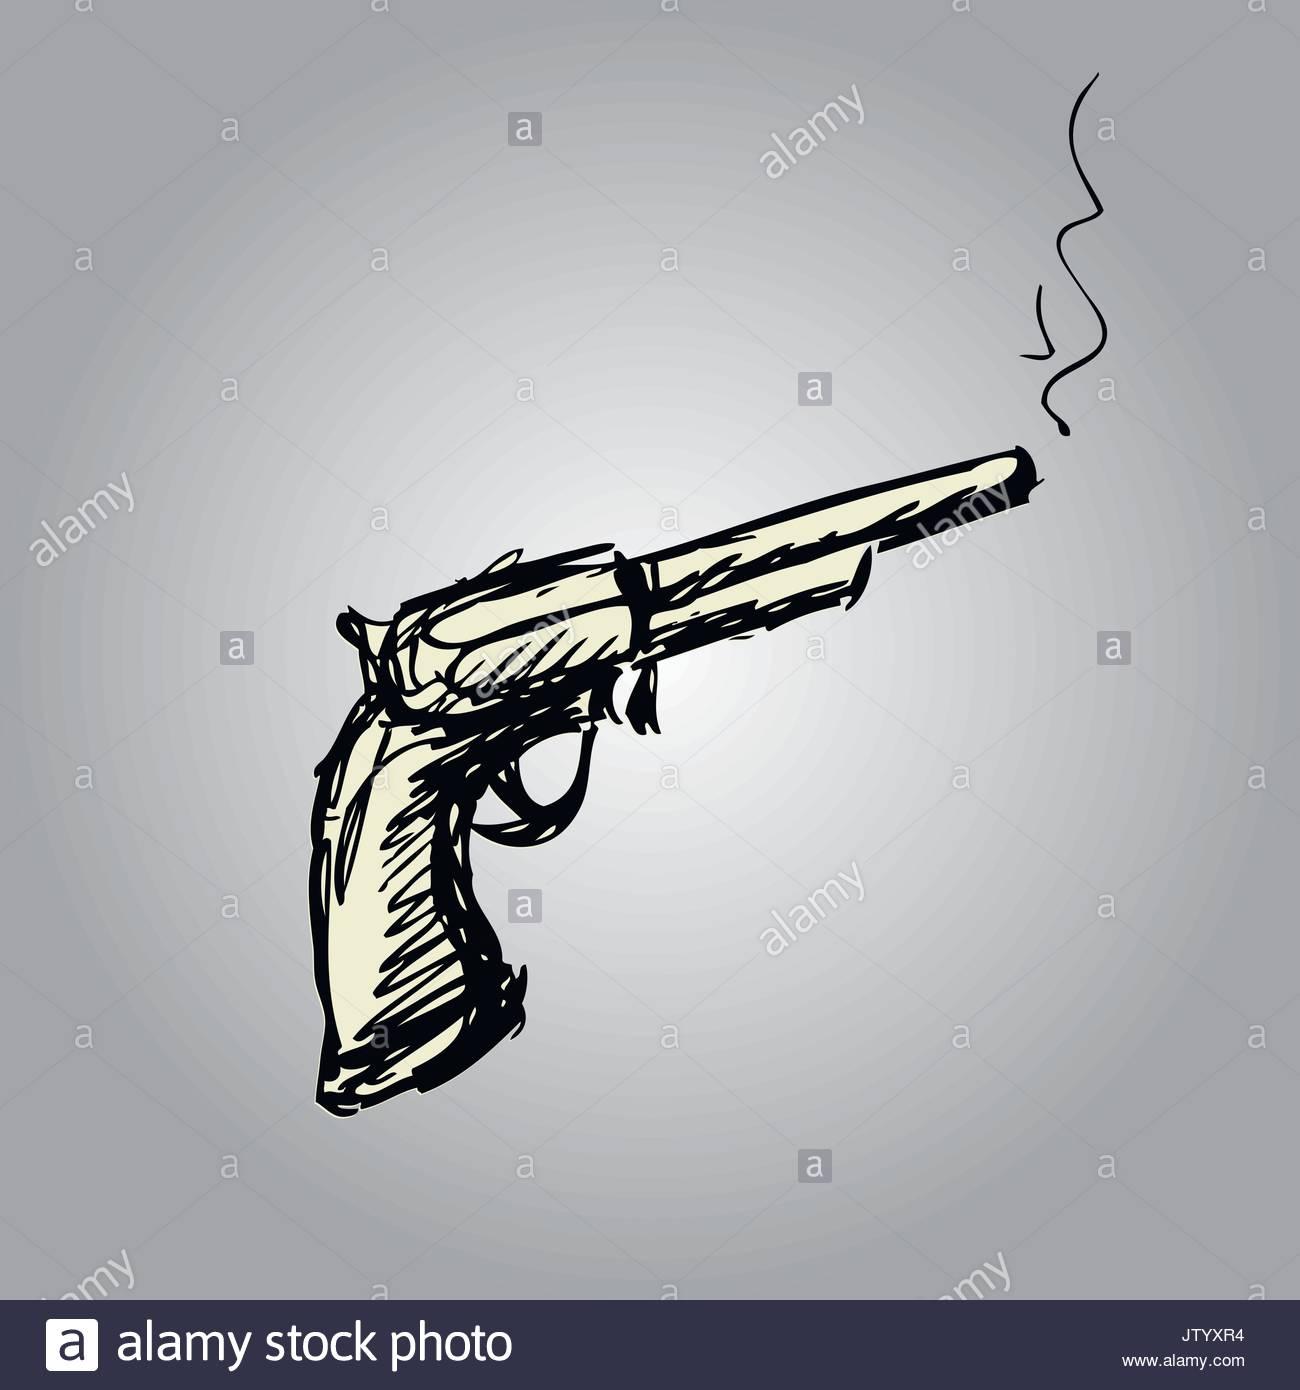 1300x1390 Handgun Or Old Revolver, Hand Drawing , Vector Illustration Stock